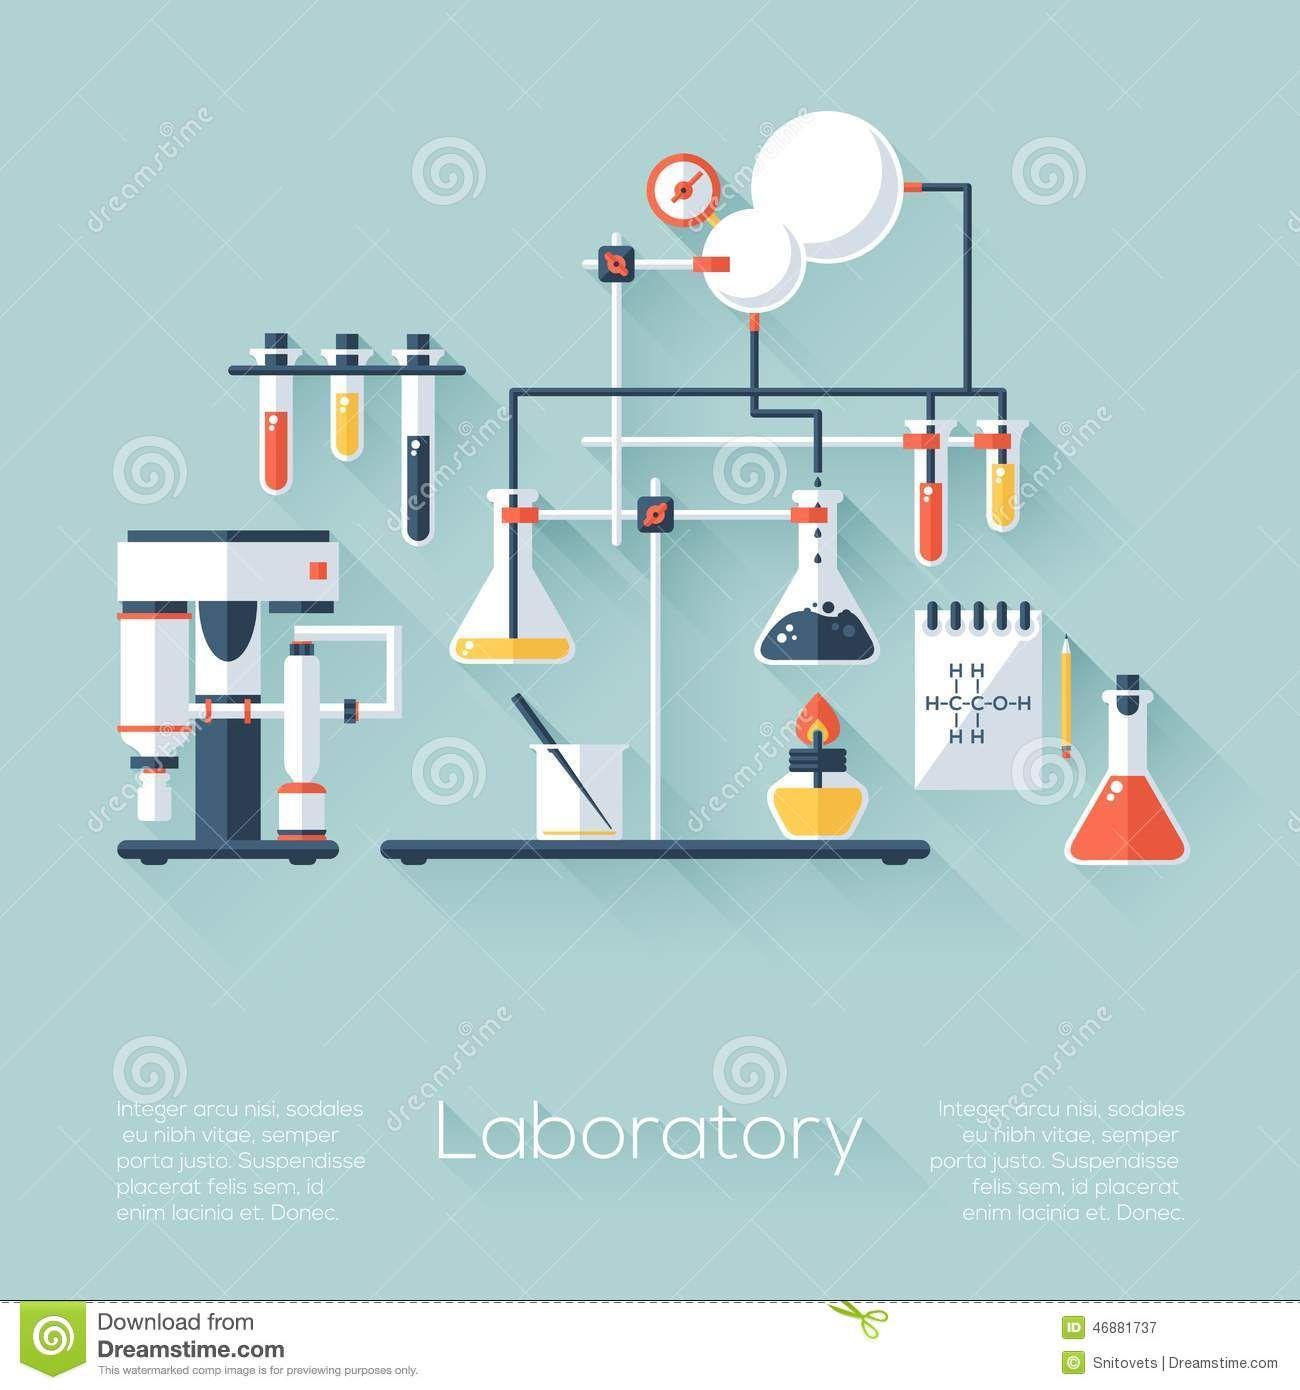 Laboratory Illustration